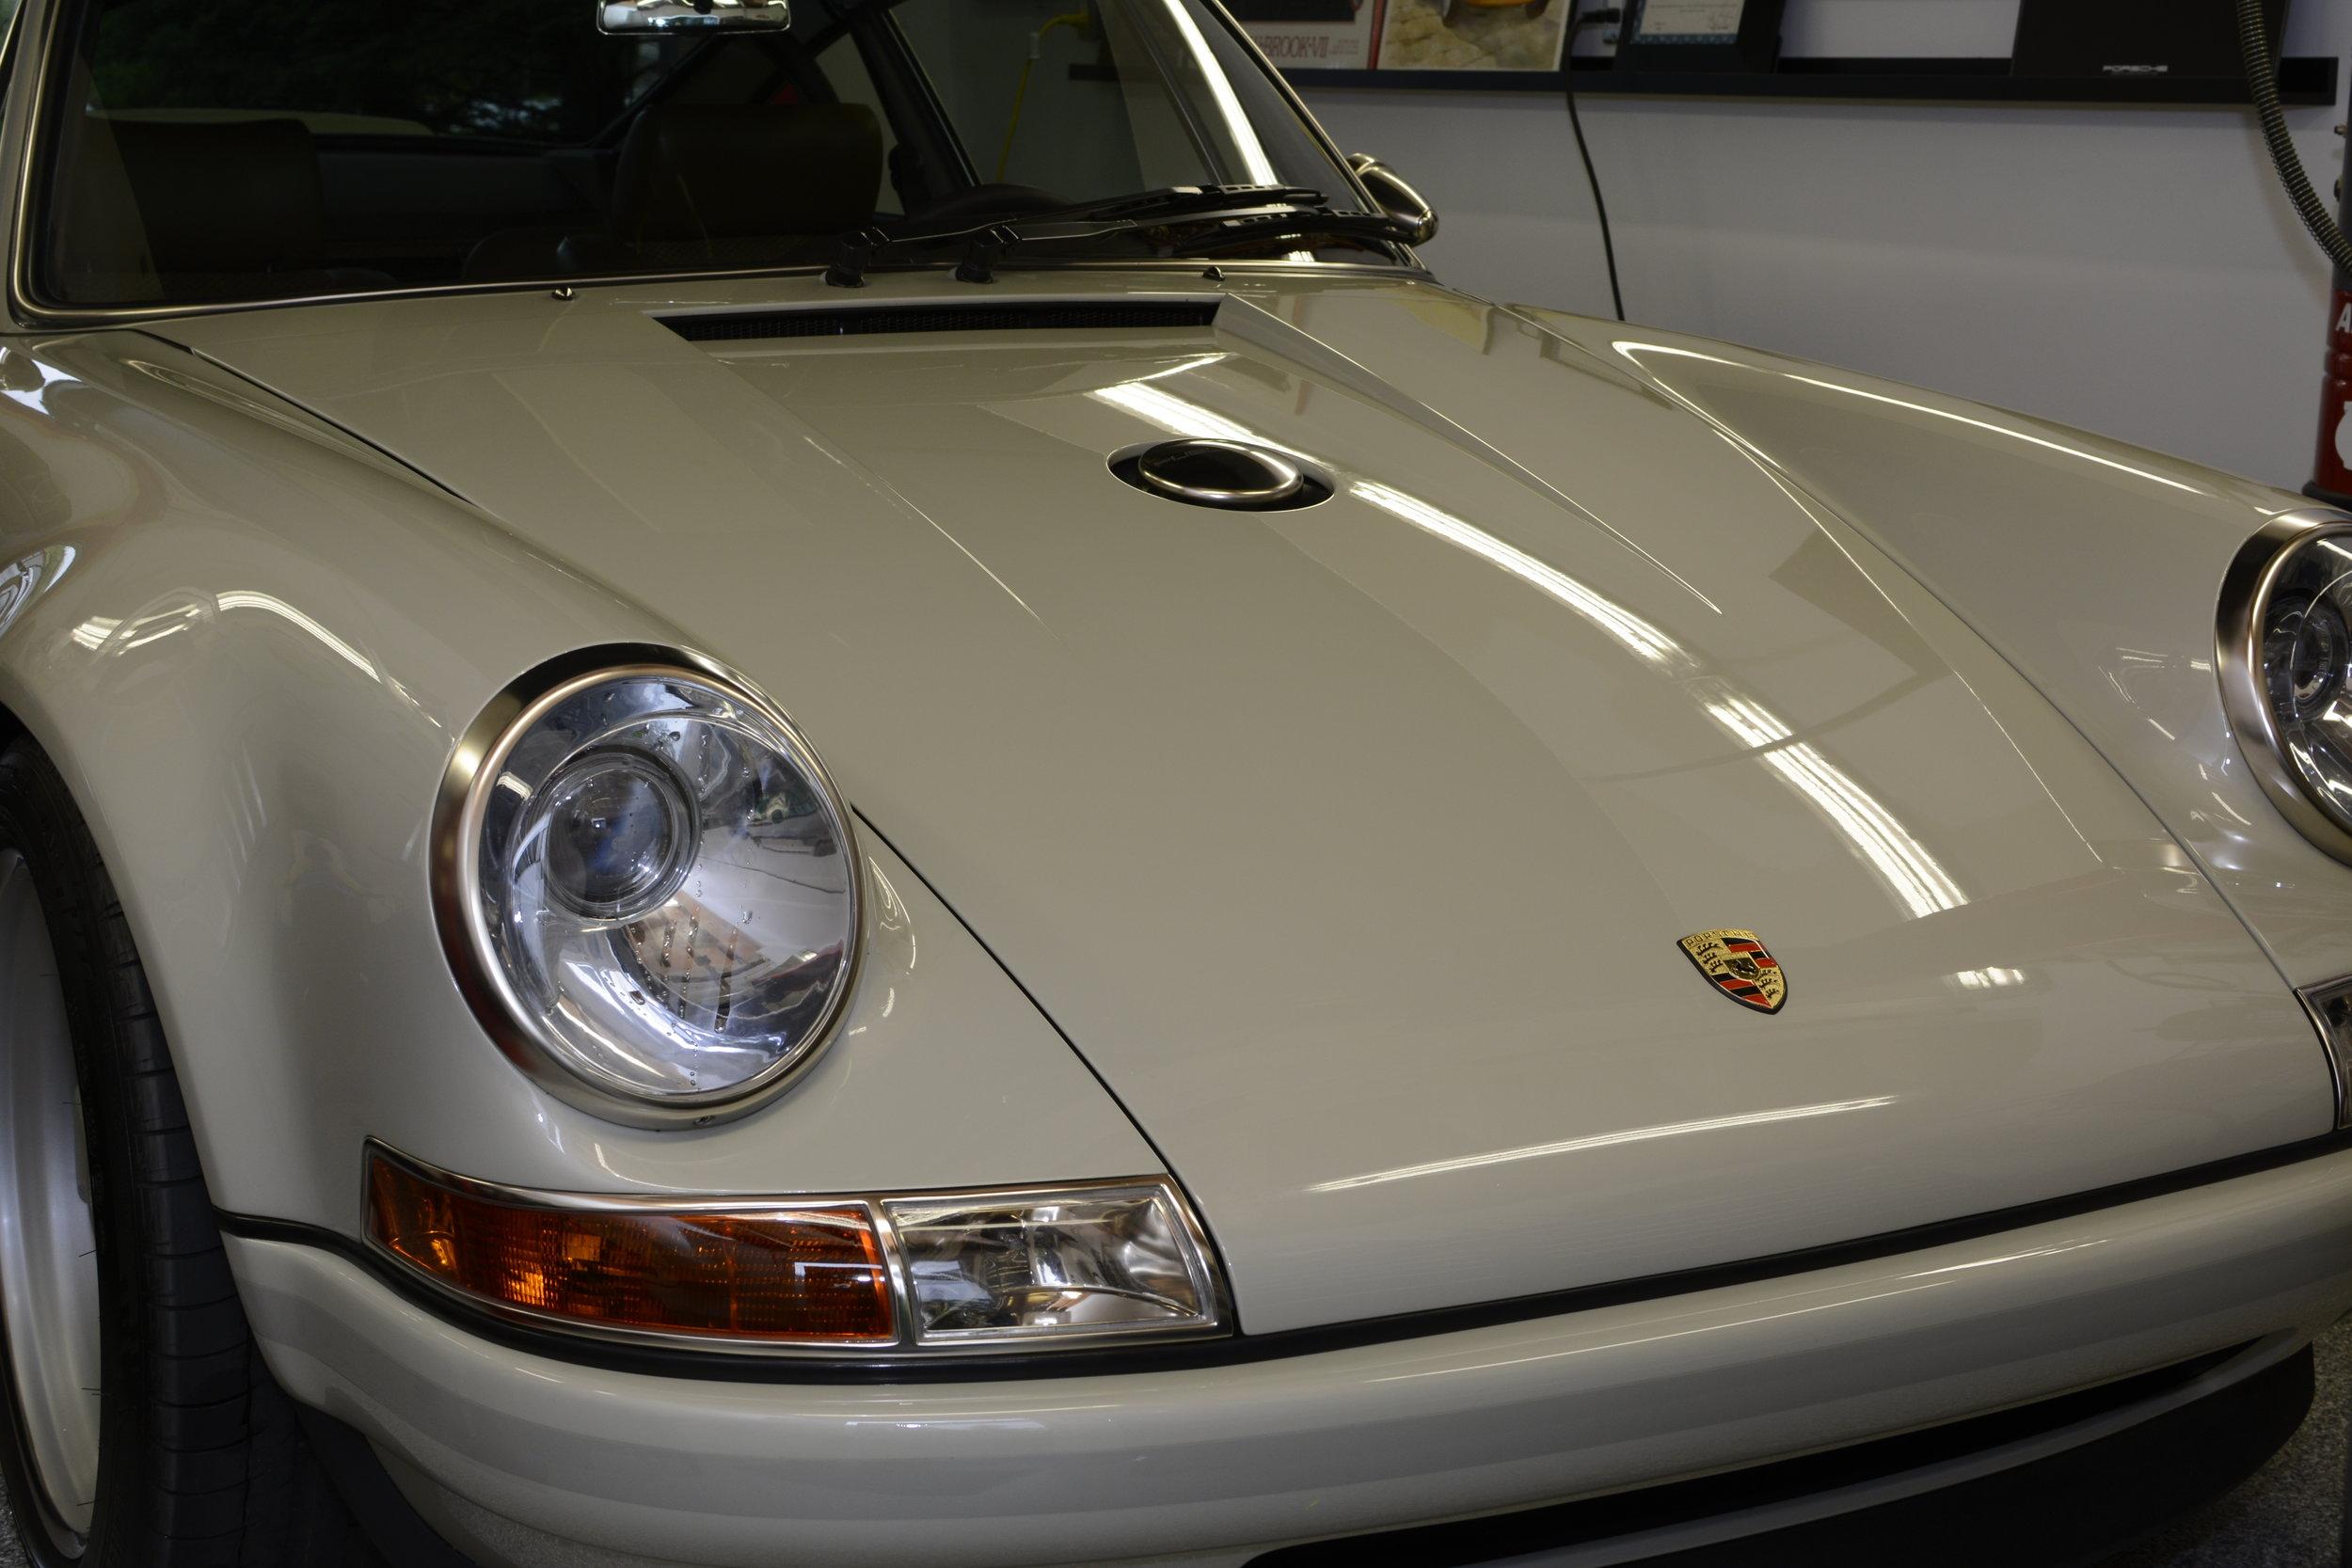 The Toronto Car - Porsche 911 by Singer Vehicle Design